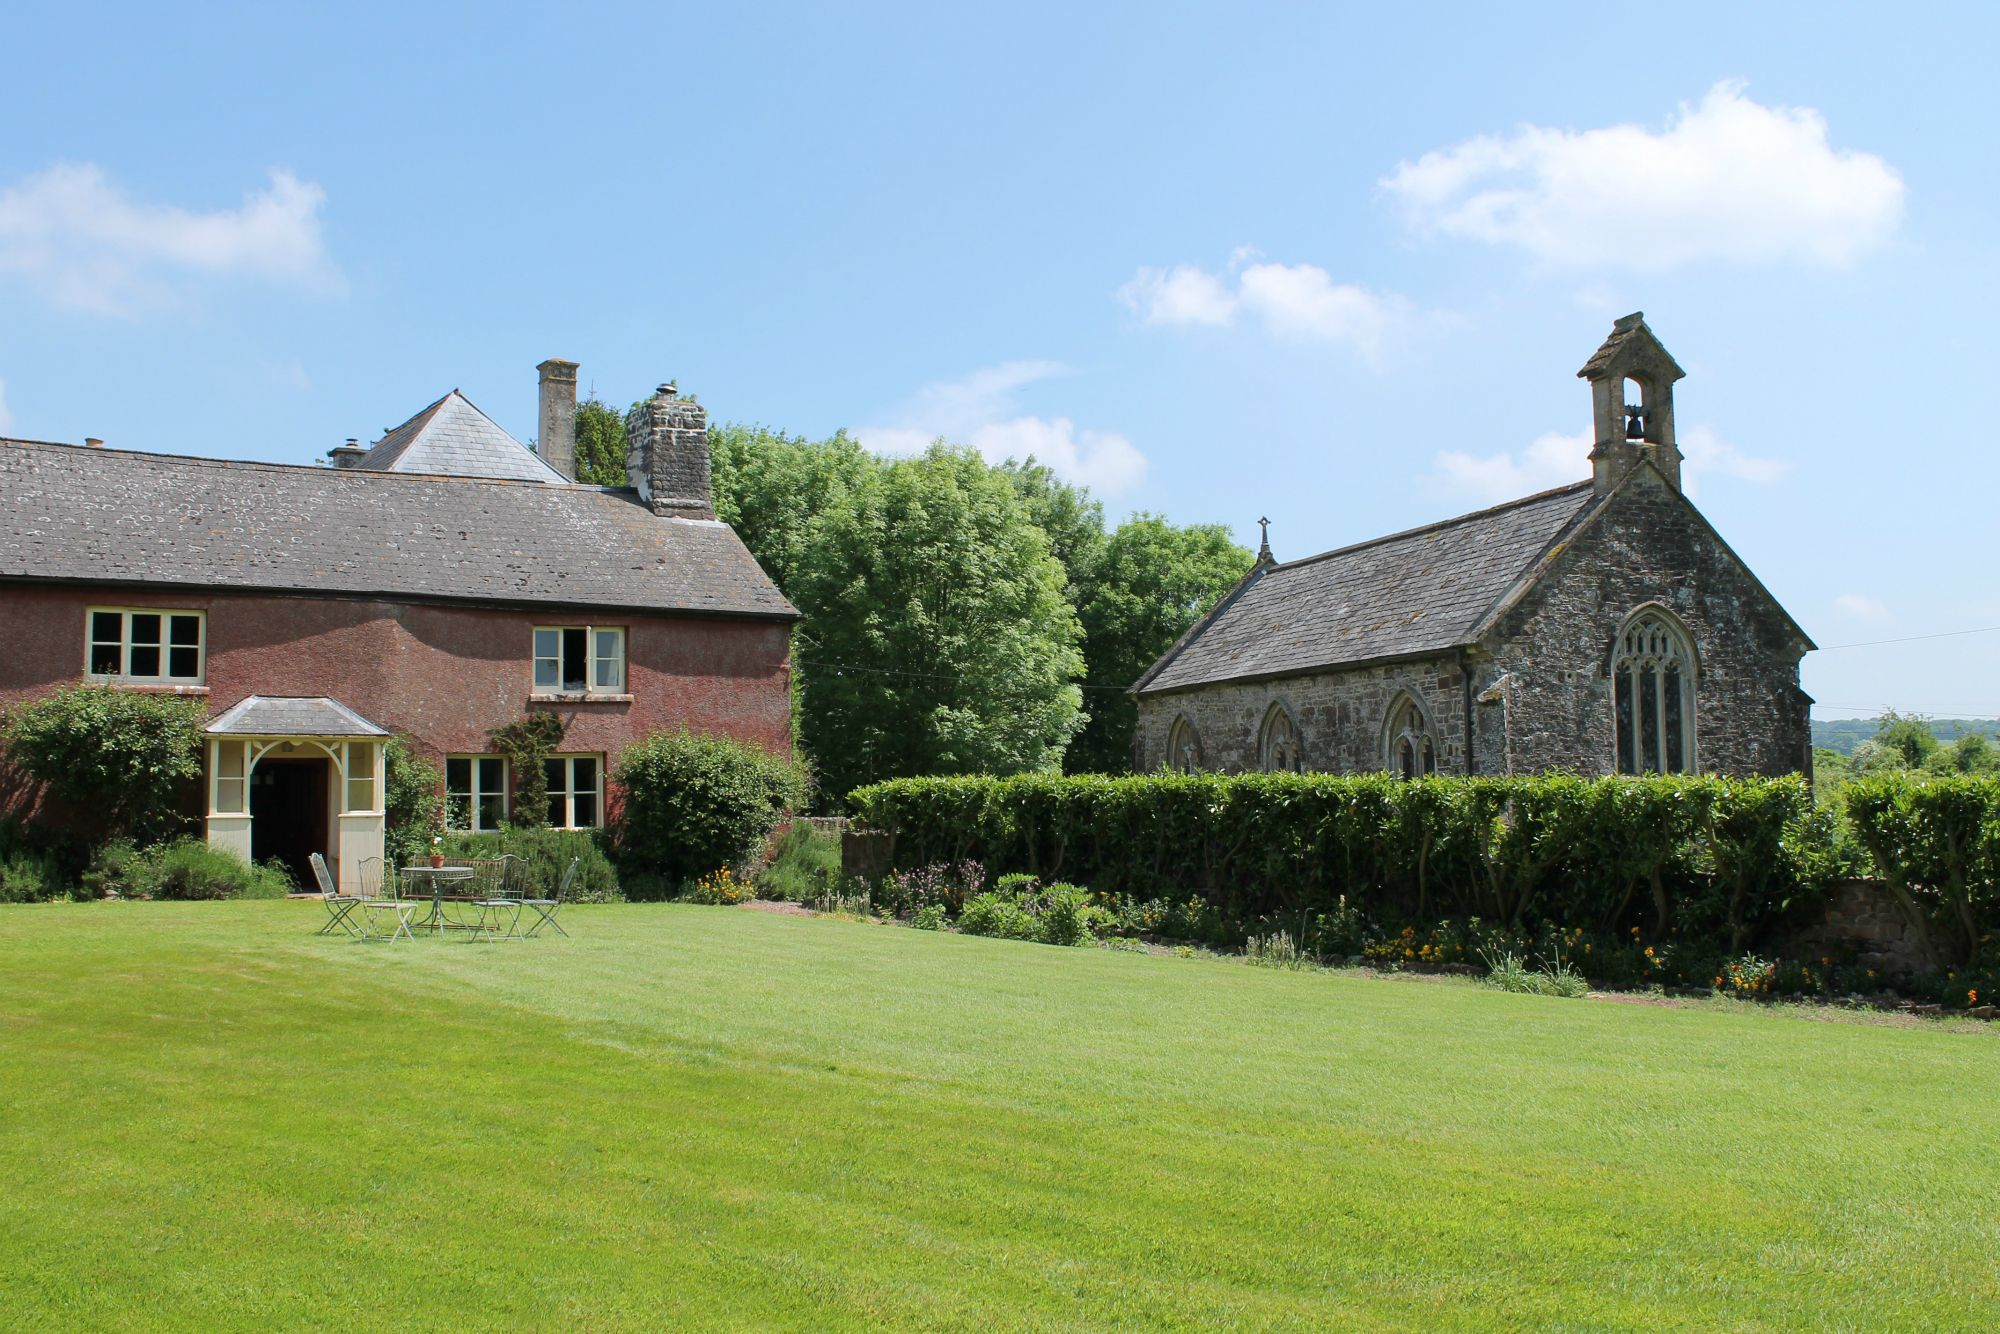 Ayshford Court, Tiverton - Sawday's